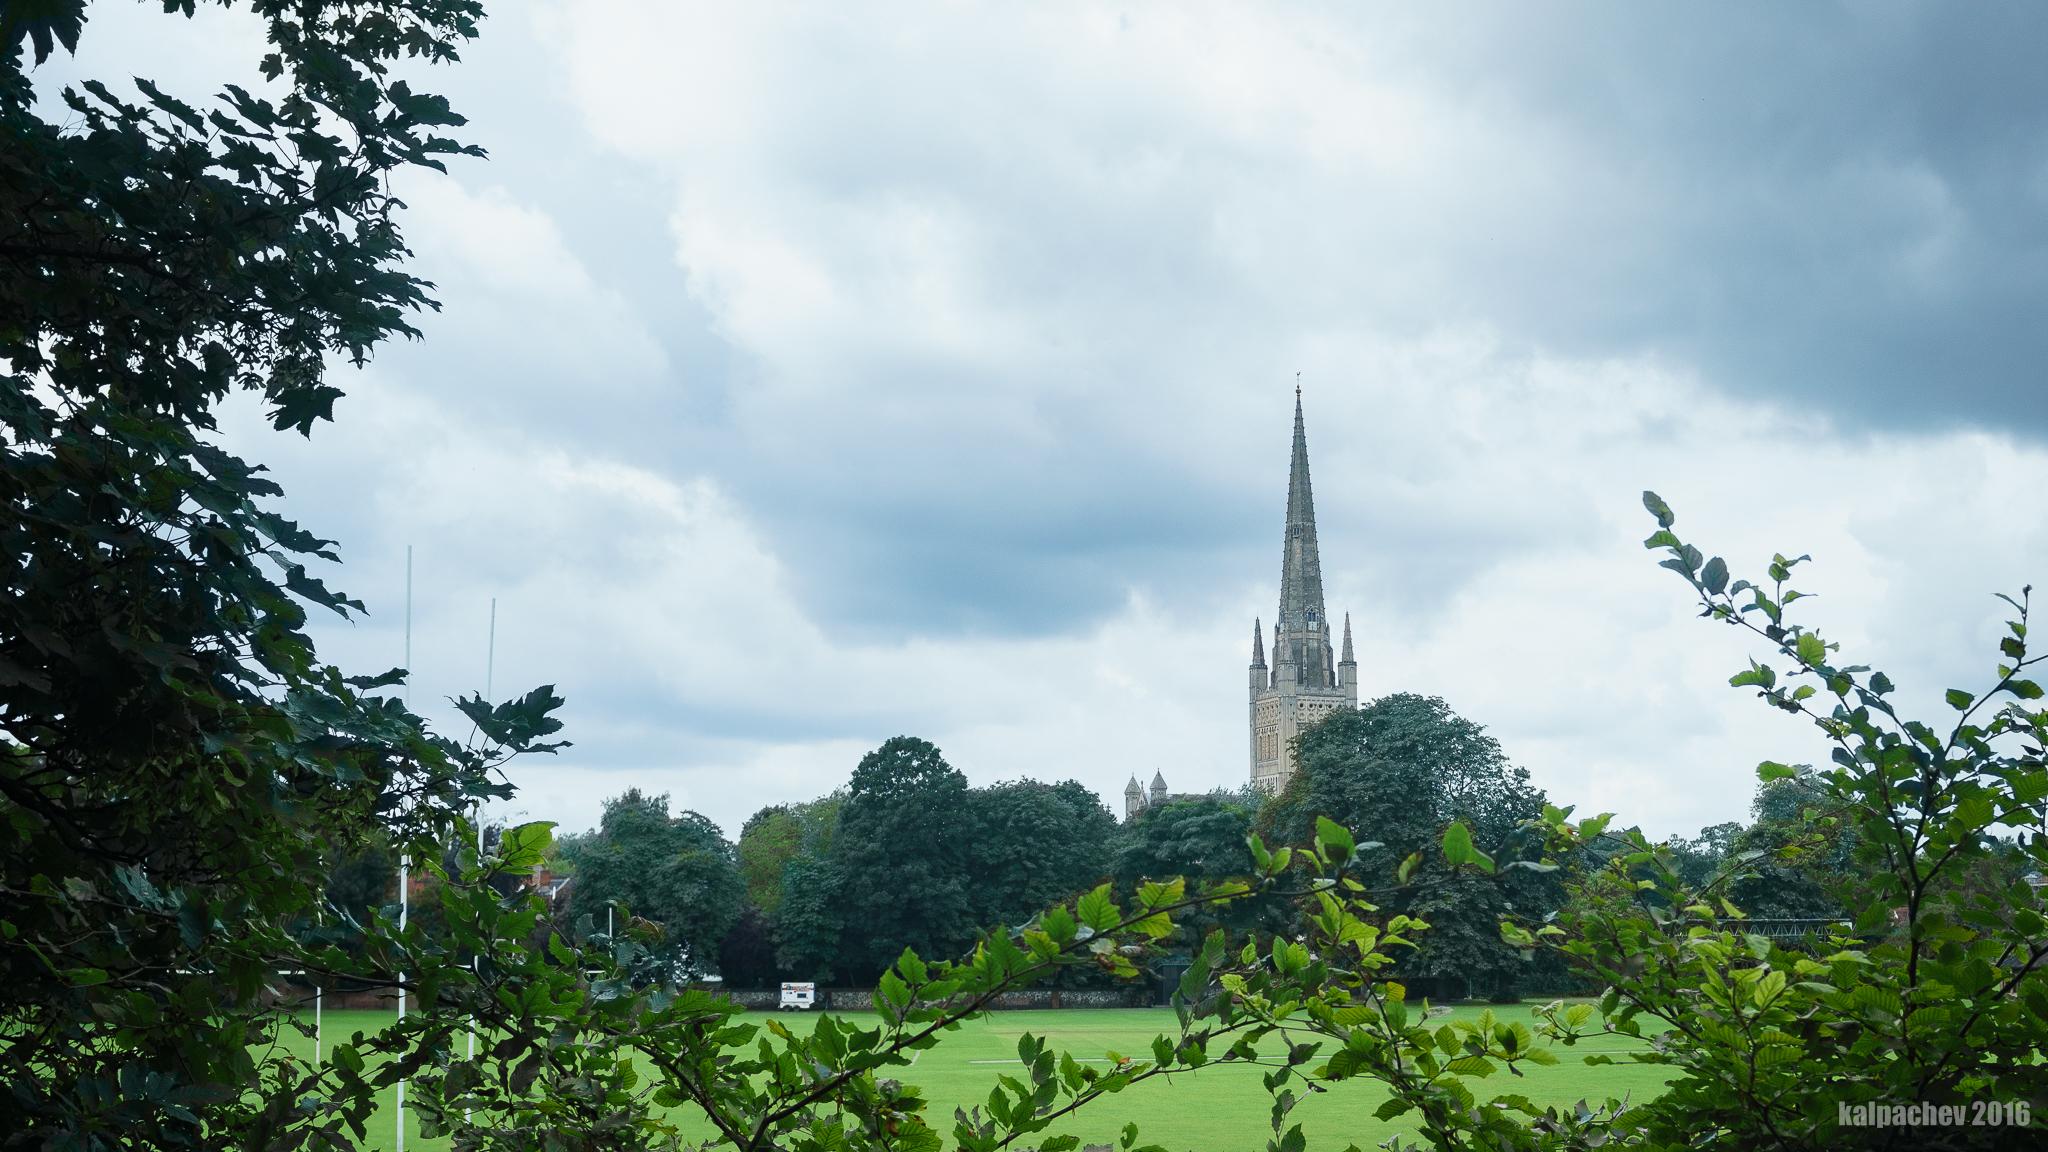 Trip to Norwich UK #norwich